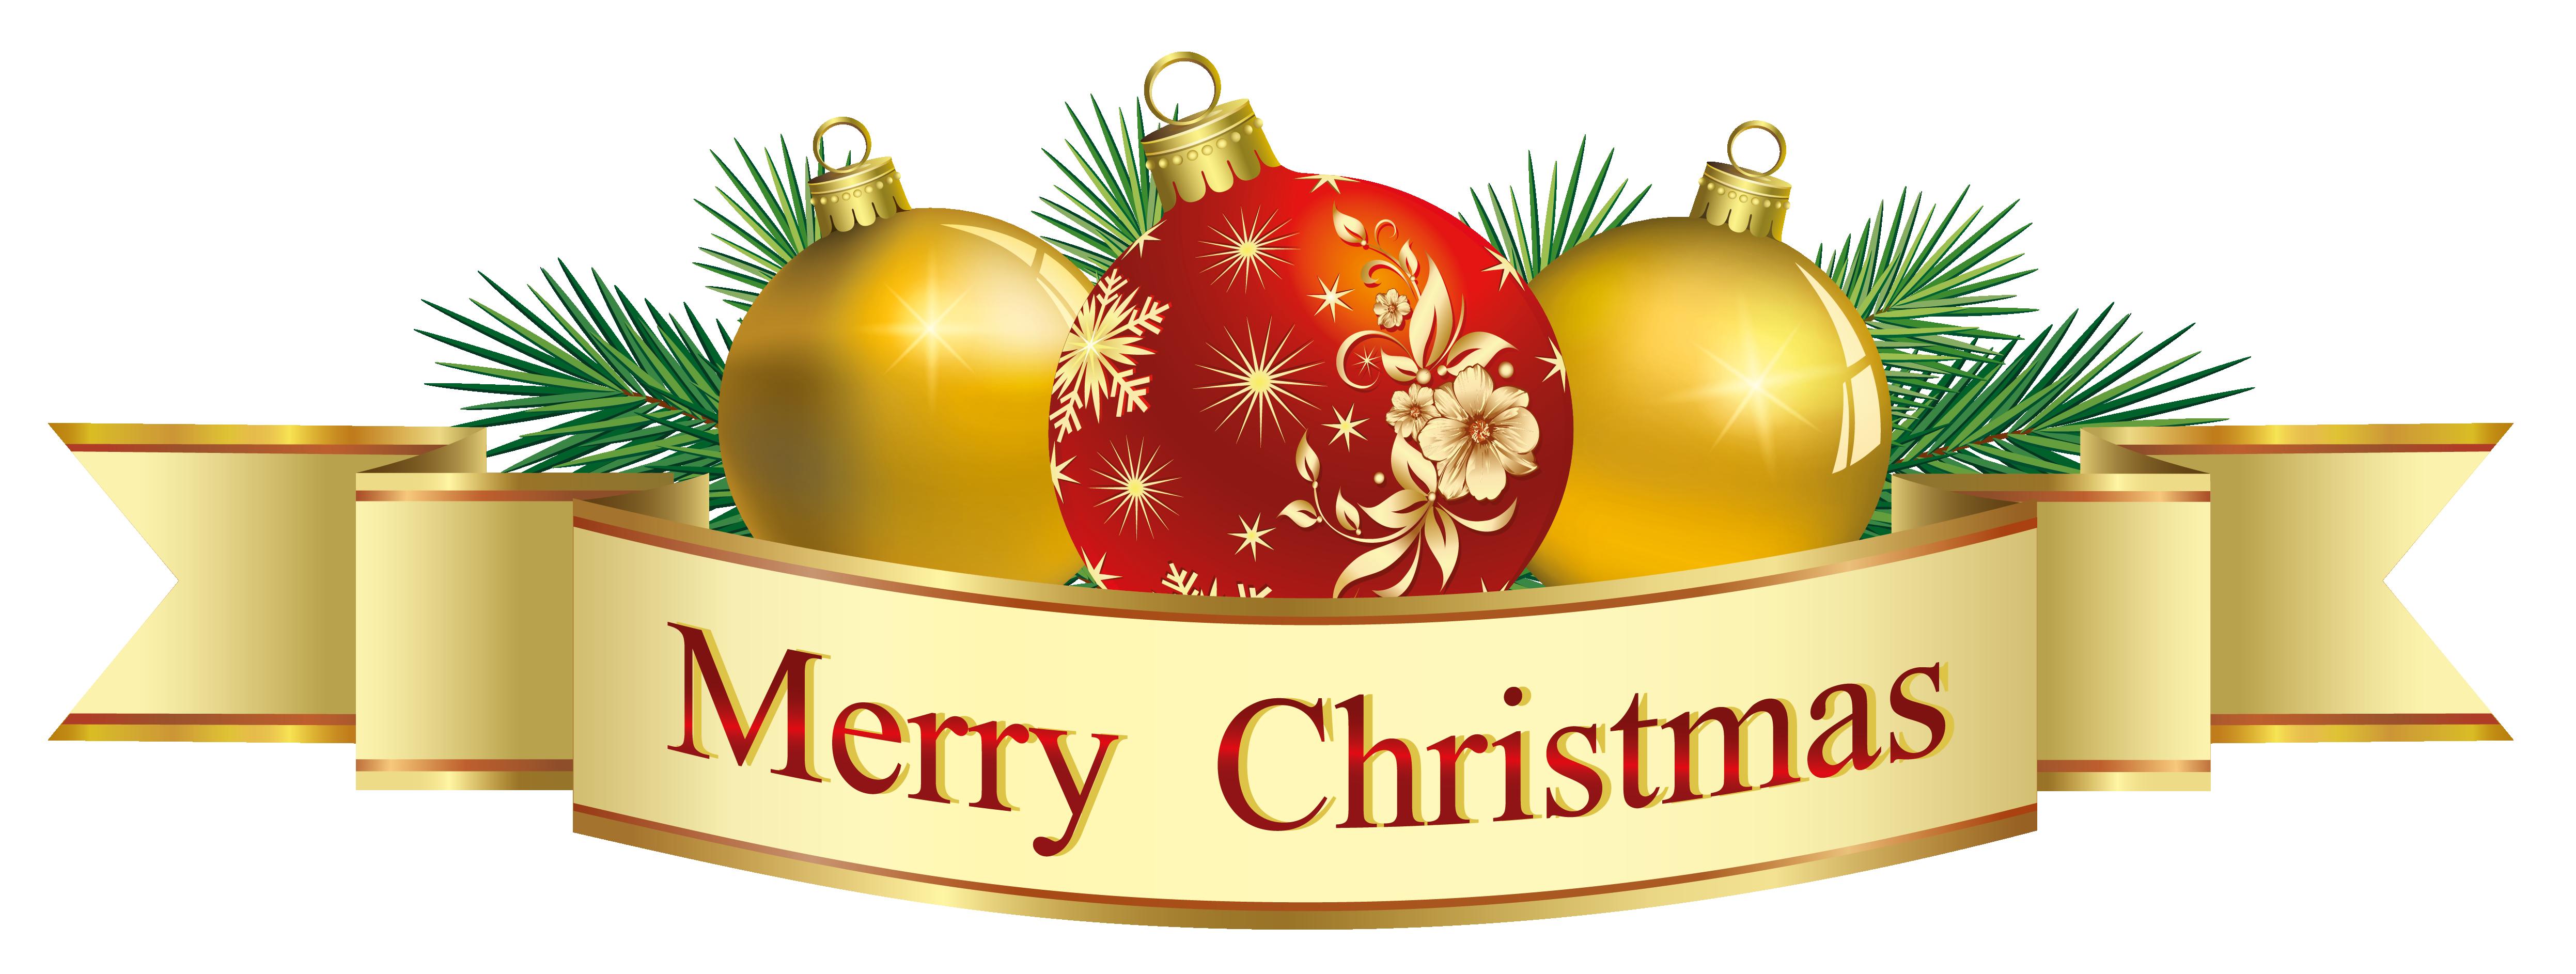 merry christmas madeira island news blog